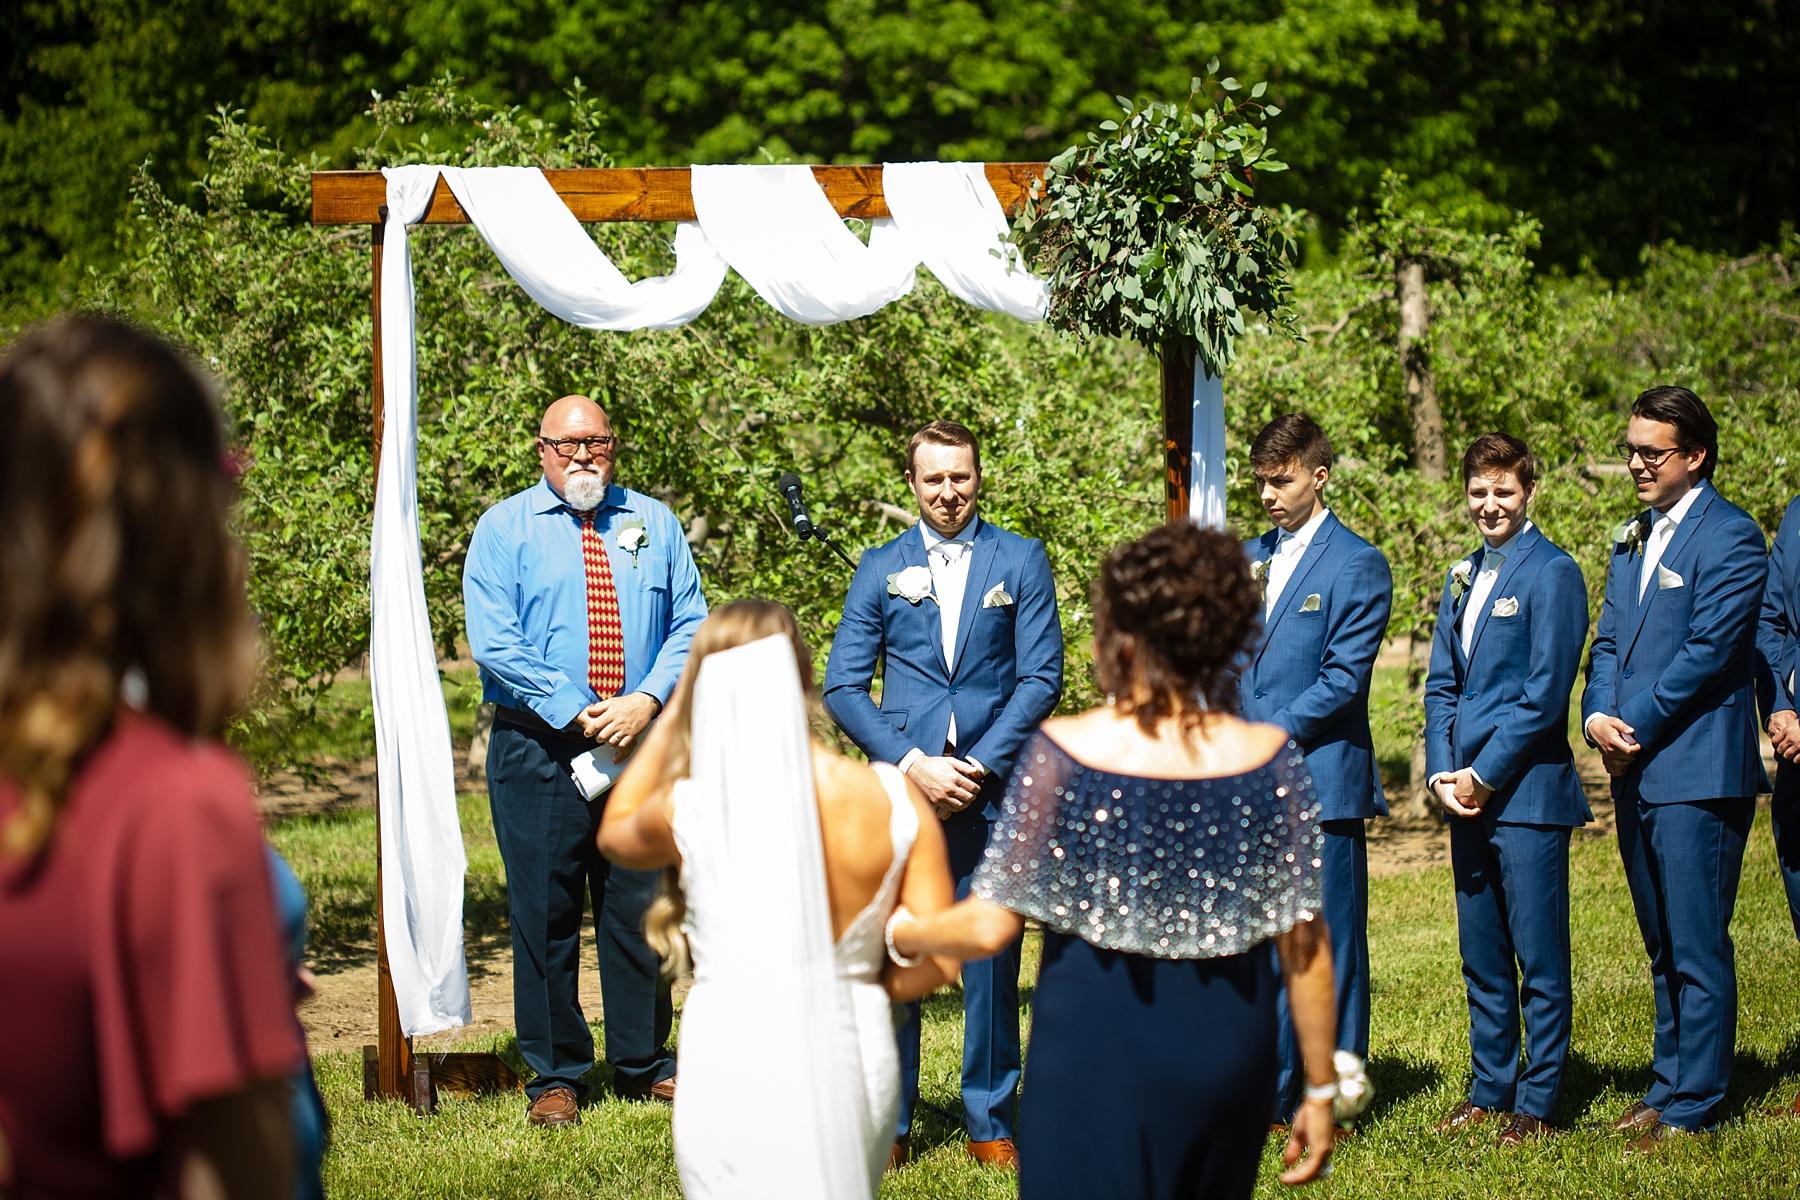 Brandon_Shafer_Photography_Kara_Doug_12_corners_Wedding_Benton_Harbor_0039.jpg